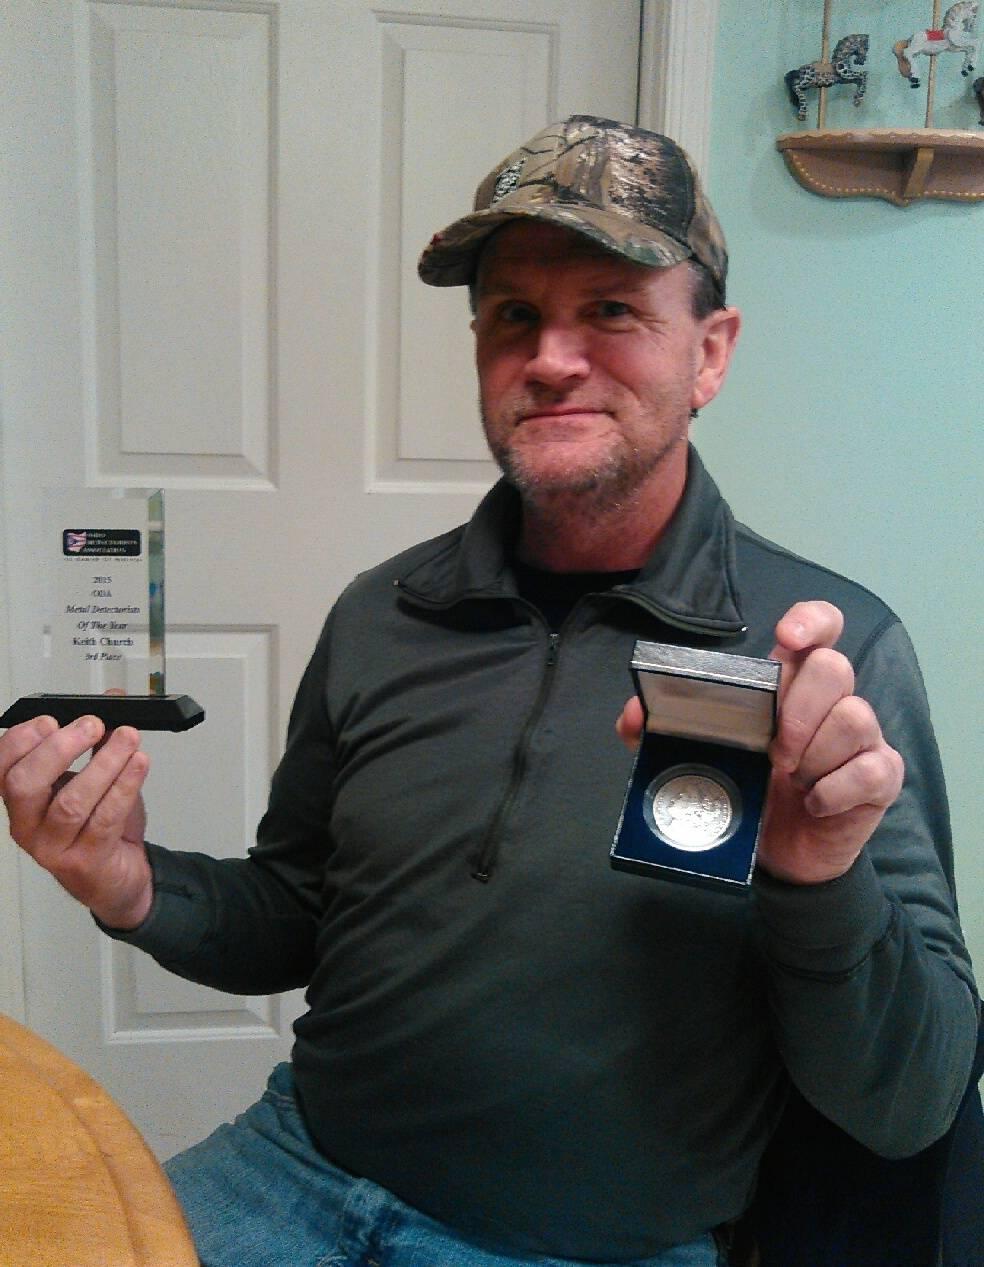 Keith Church DOTY Winner